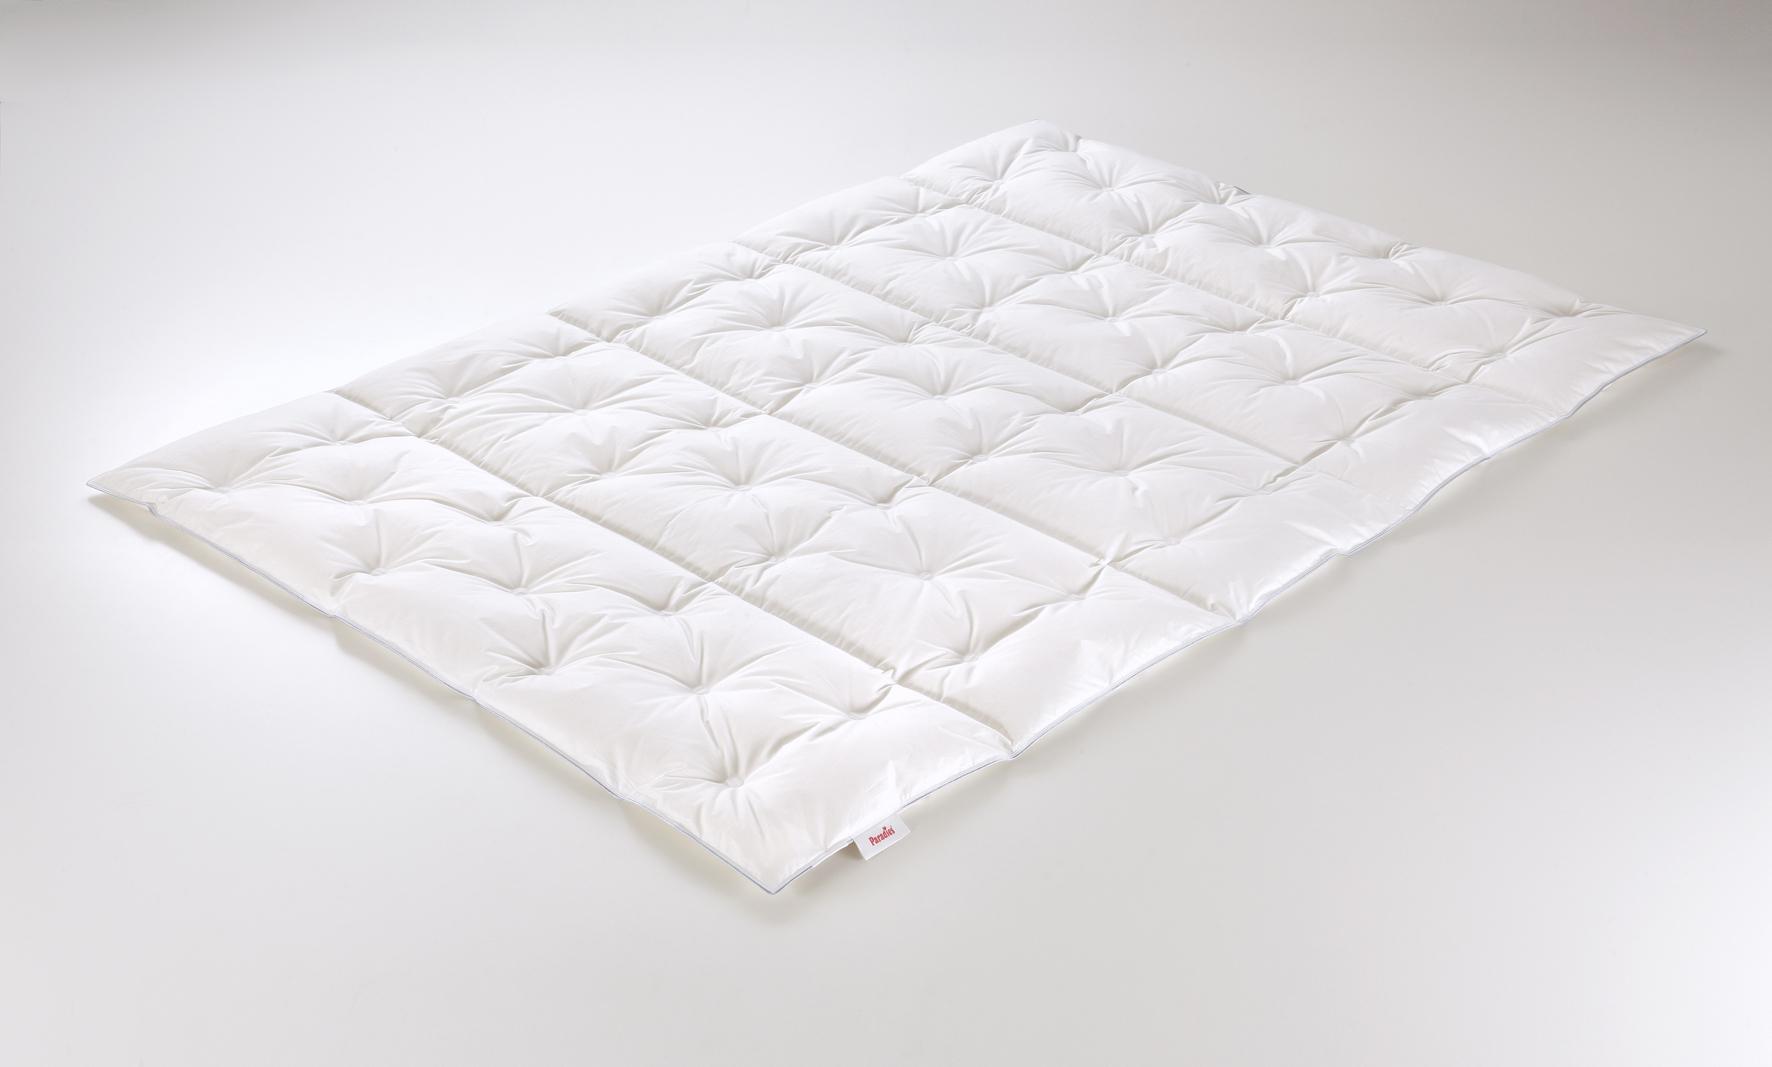 Одеяла Одеяло пуховое 155х200 Paradies Arabella Light elitnoe-odeyalo-155h200-arabella-light-ot-paradies-germaniya.jpg